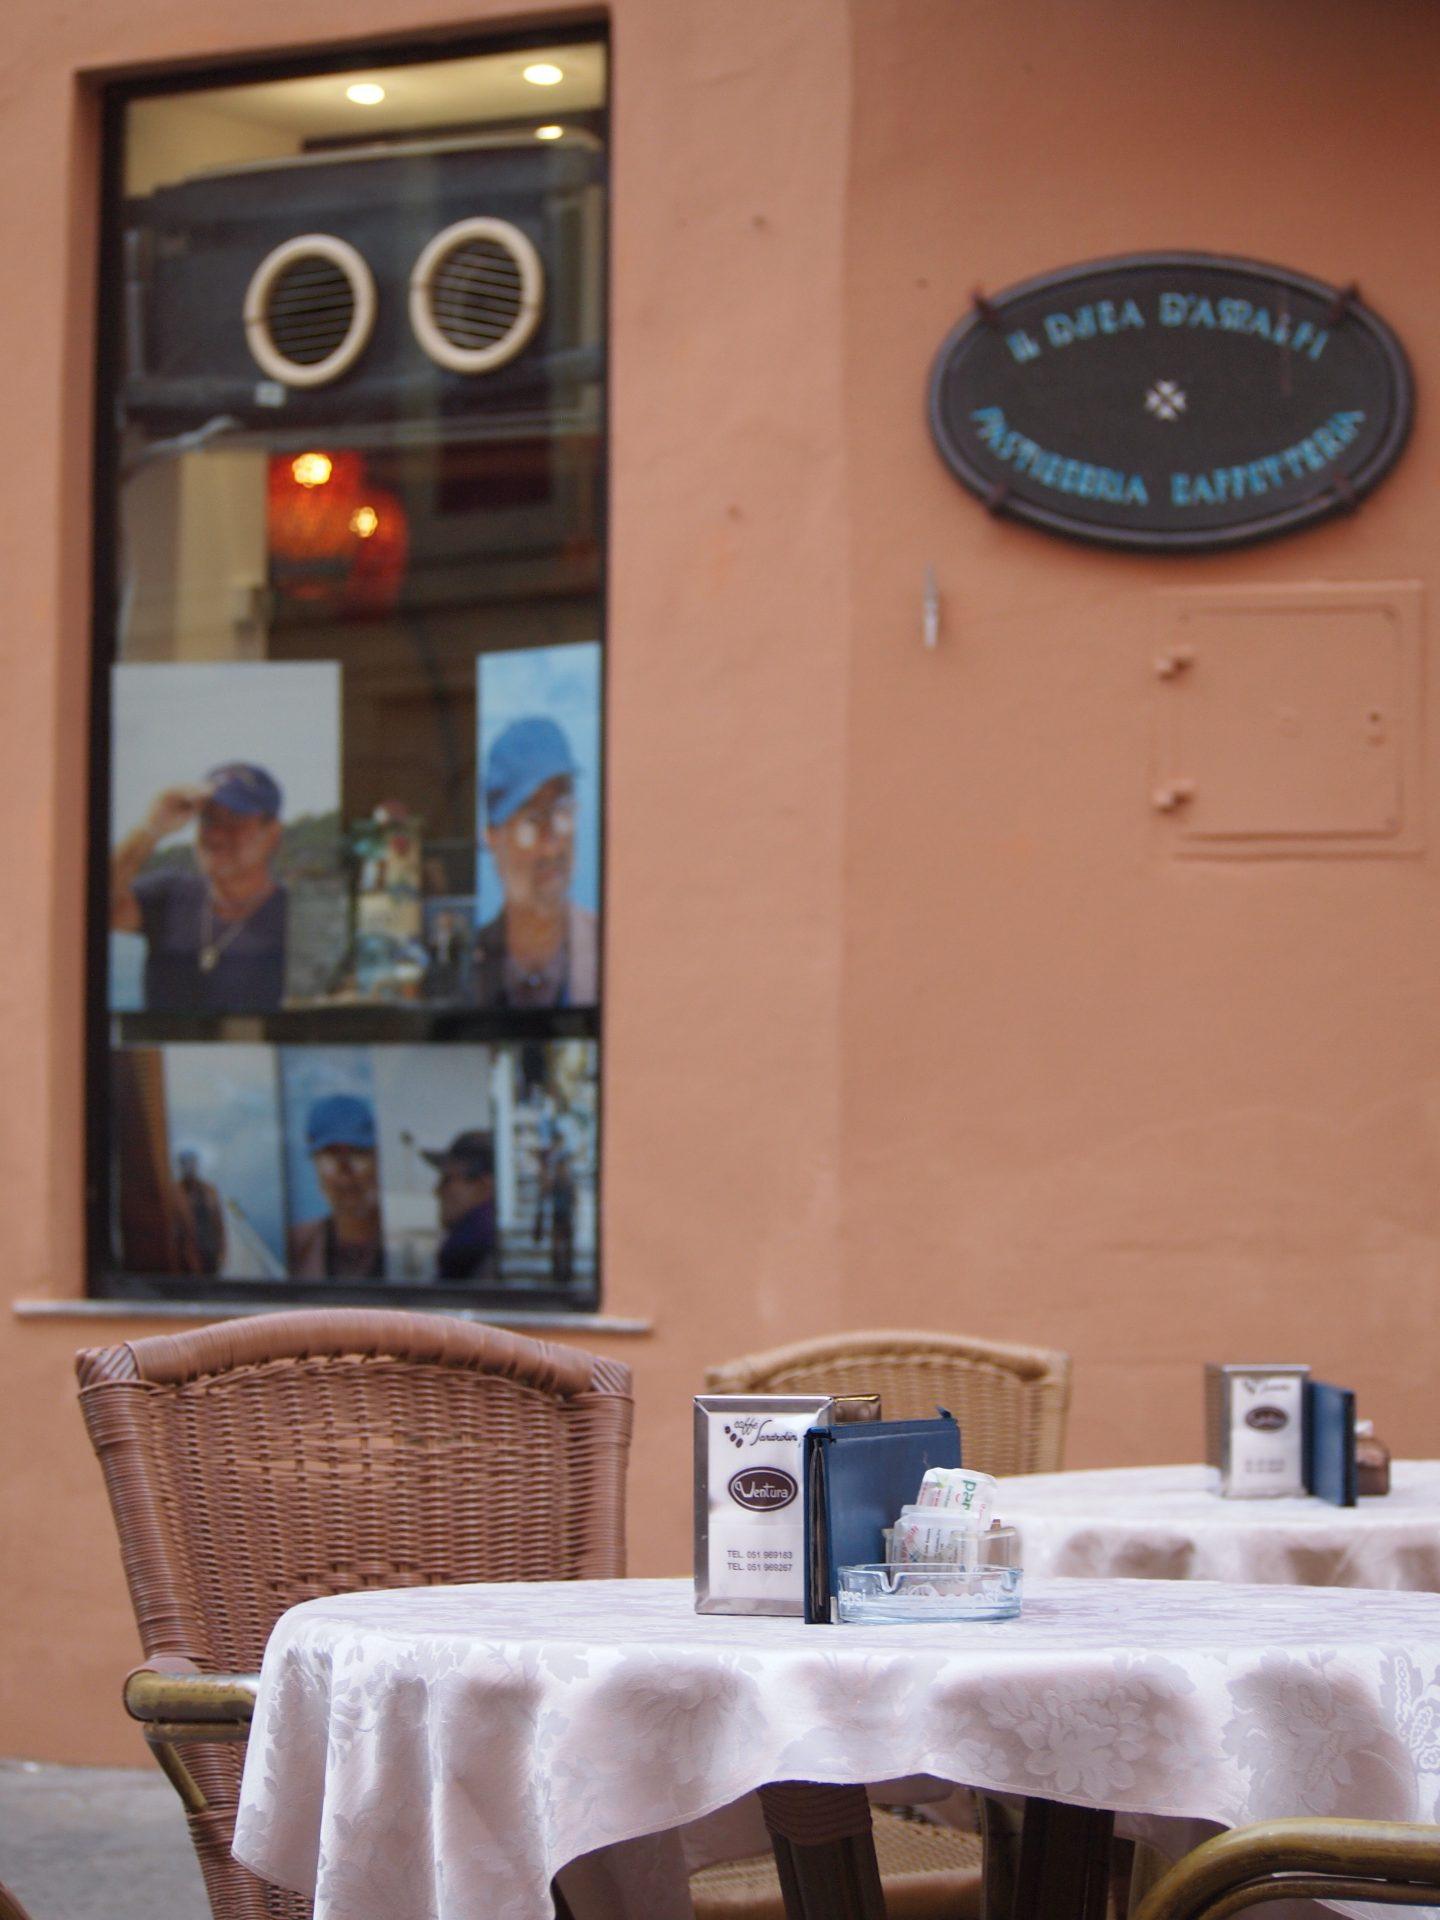 bar duca amalfi, foto di Gloria